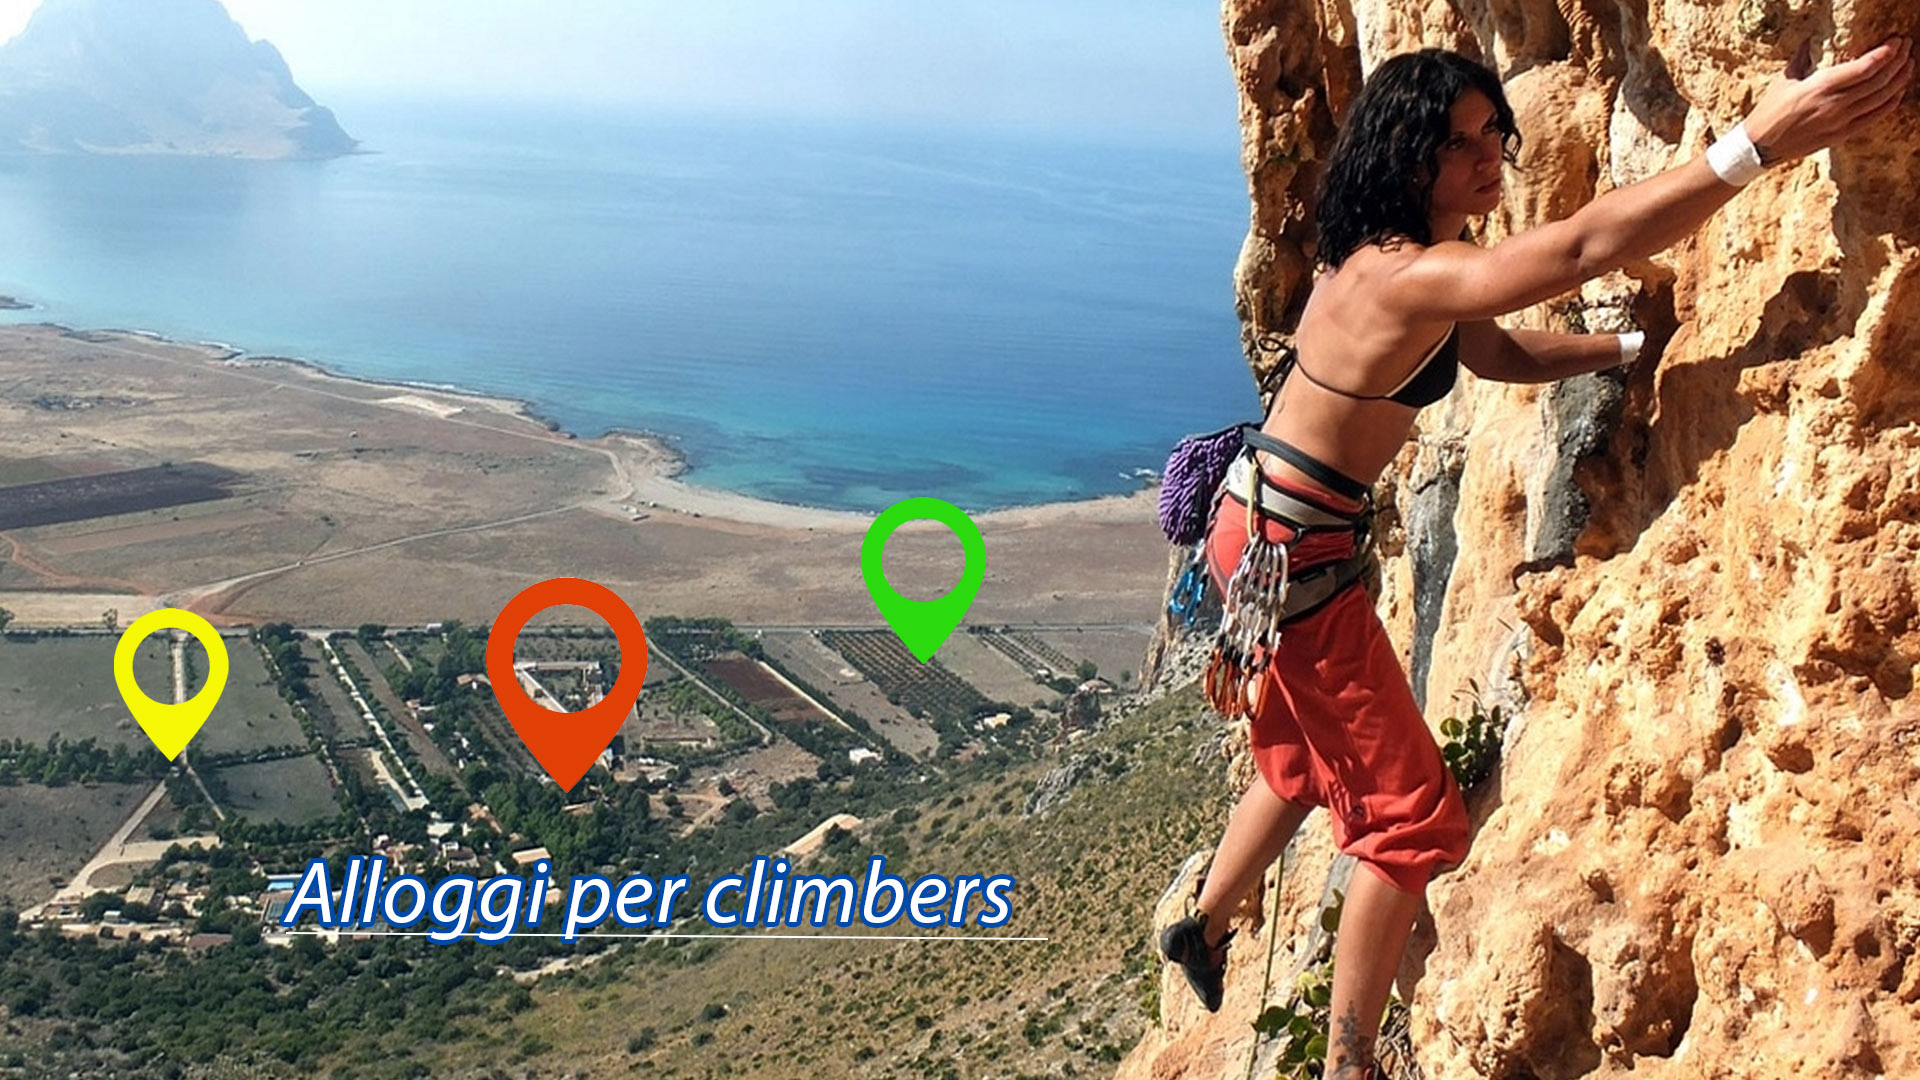 alloggi-climbers-san-vito-lo-capoA312DBCB-367D-30AC-BD53-4C494DF78143.jpg